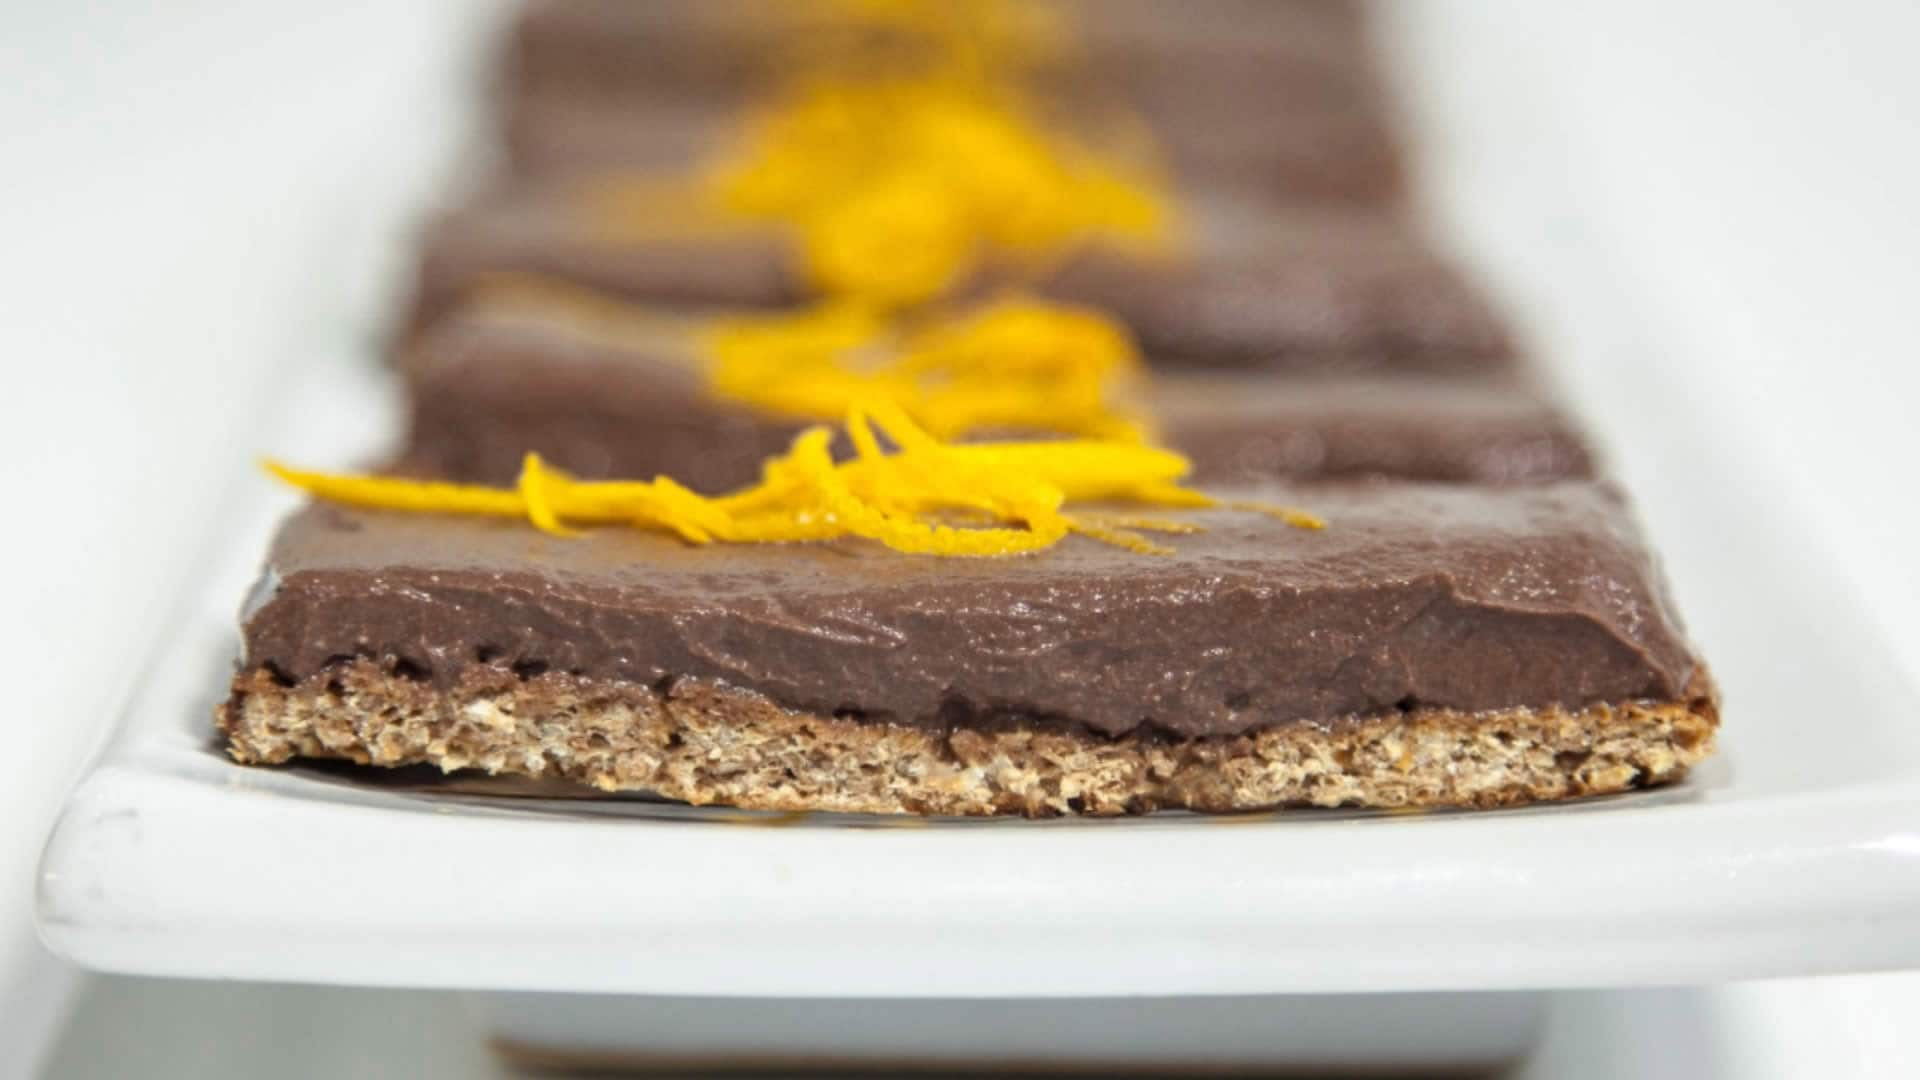 ricette per diete iperproteiche